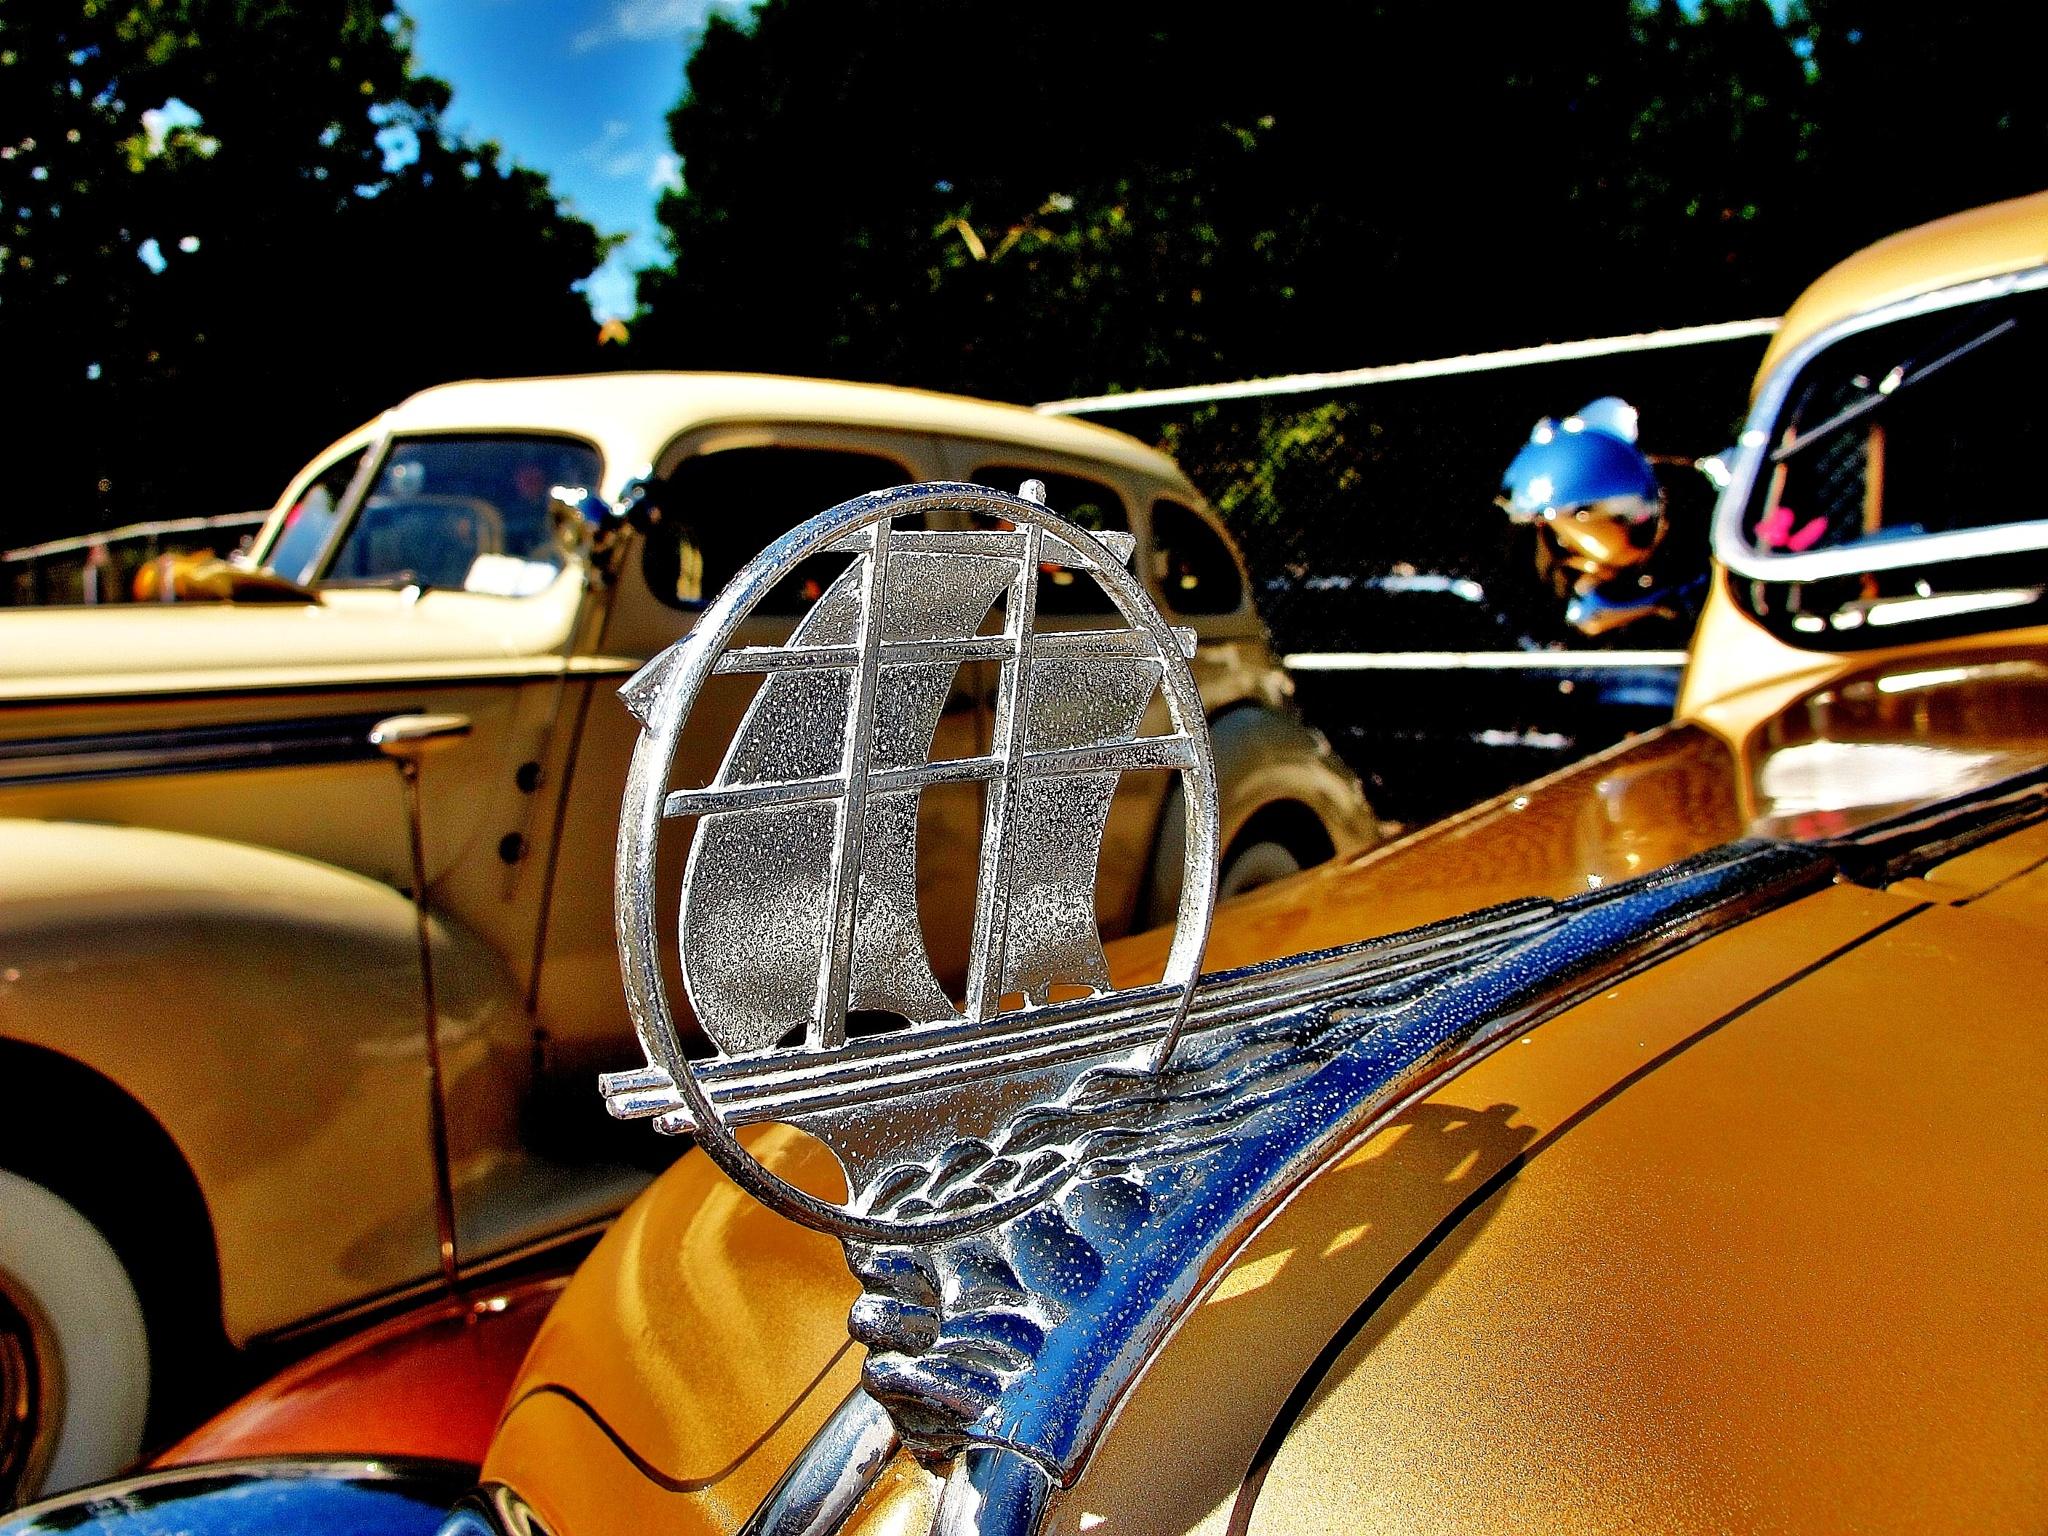 Retro Car, by Liborio Drogo